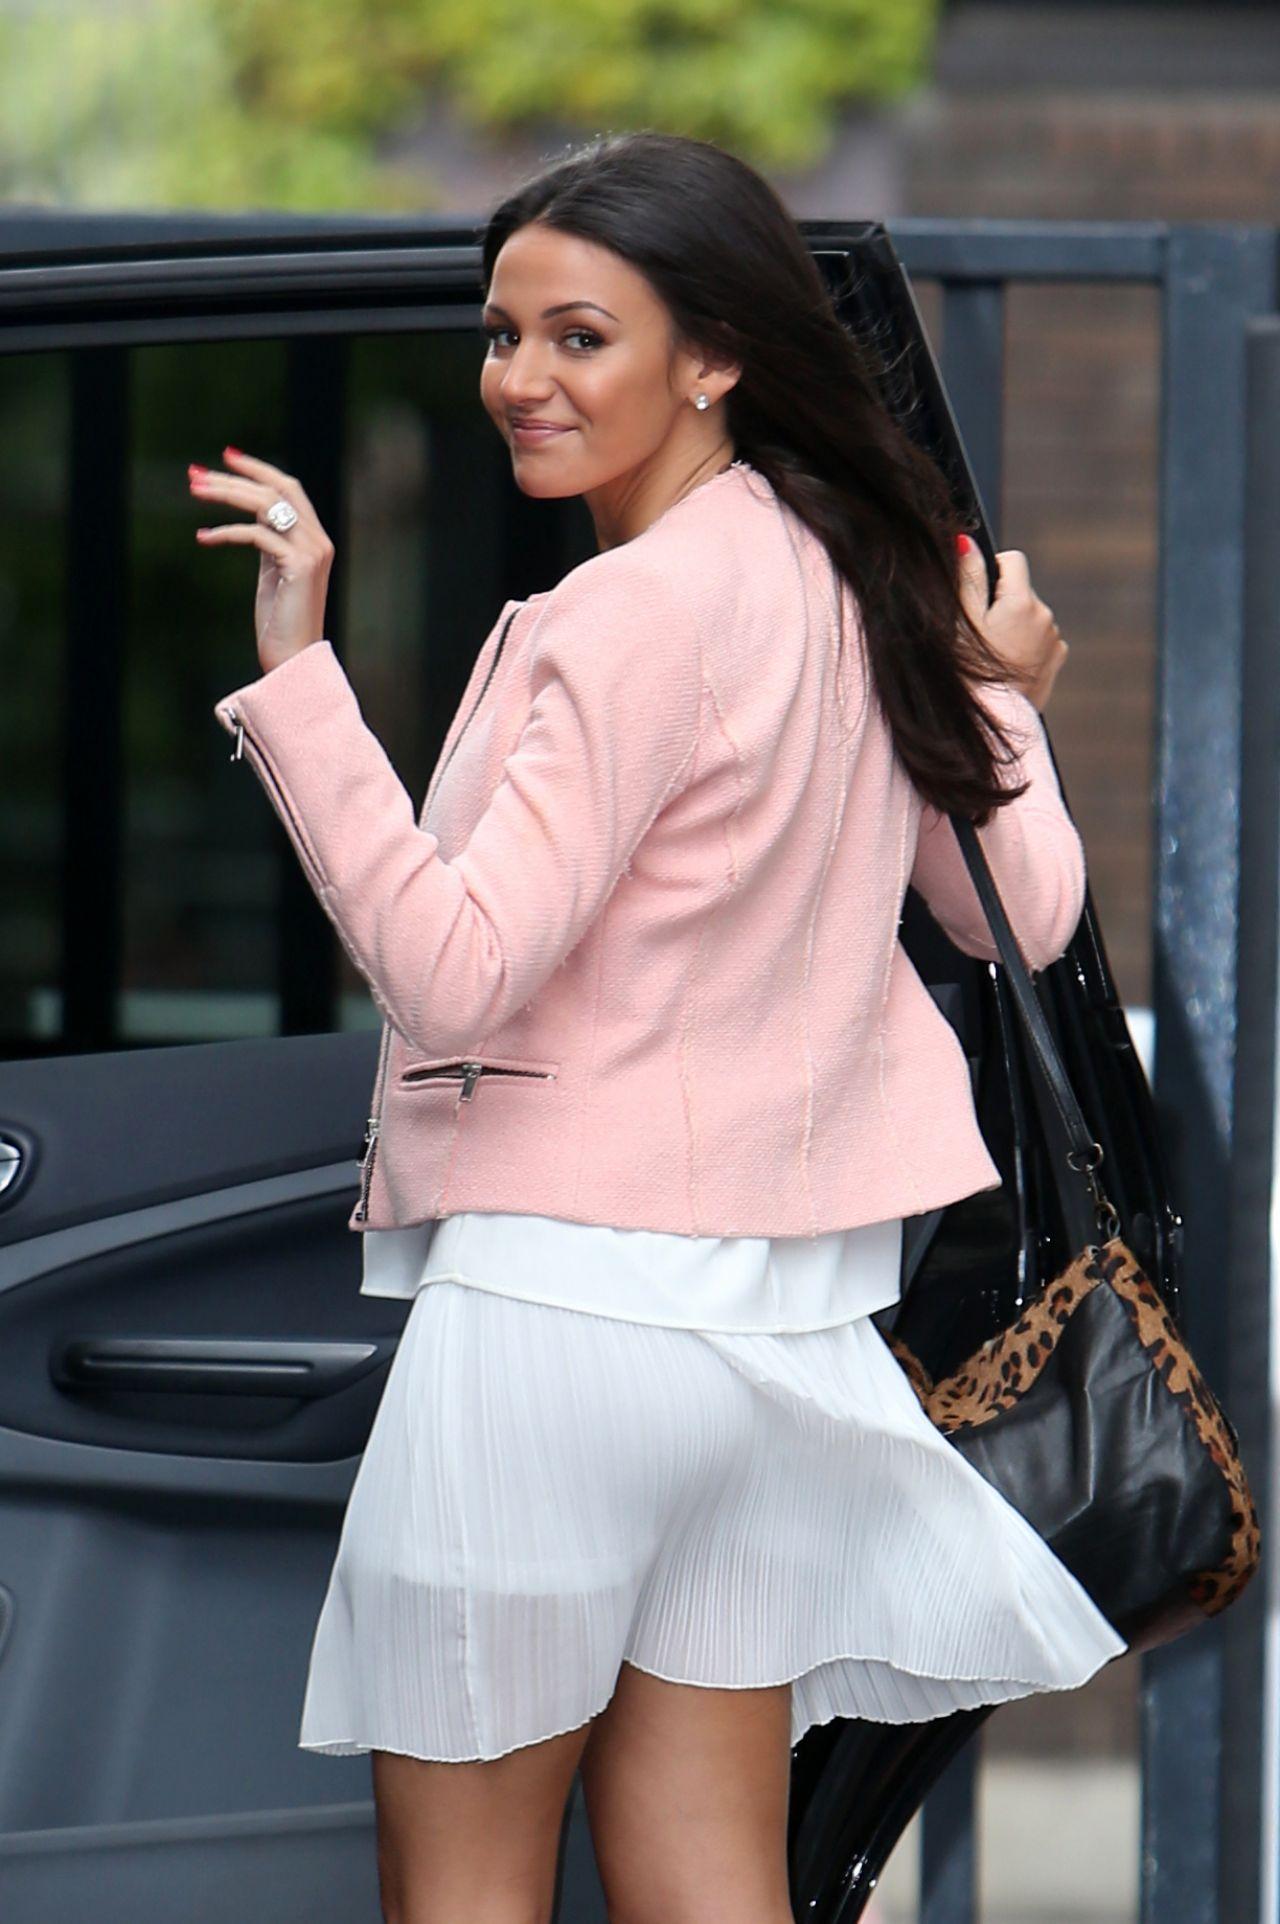 Michelle Keegan In White Skirt Leaving Itv Studios May